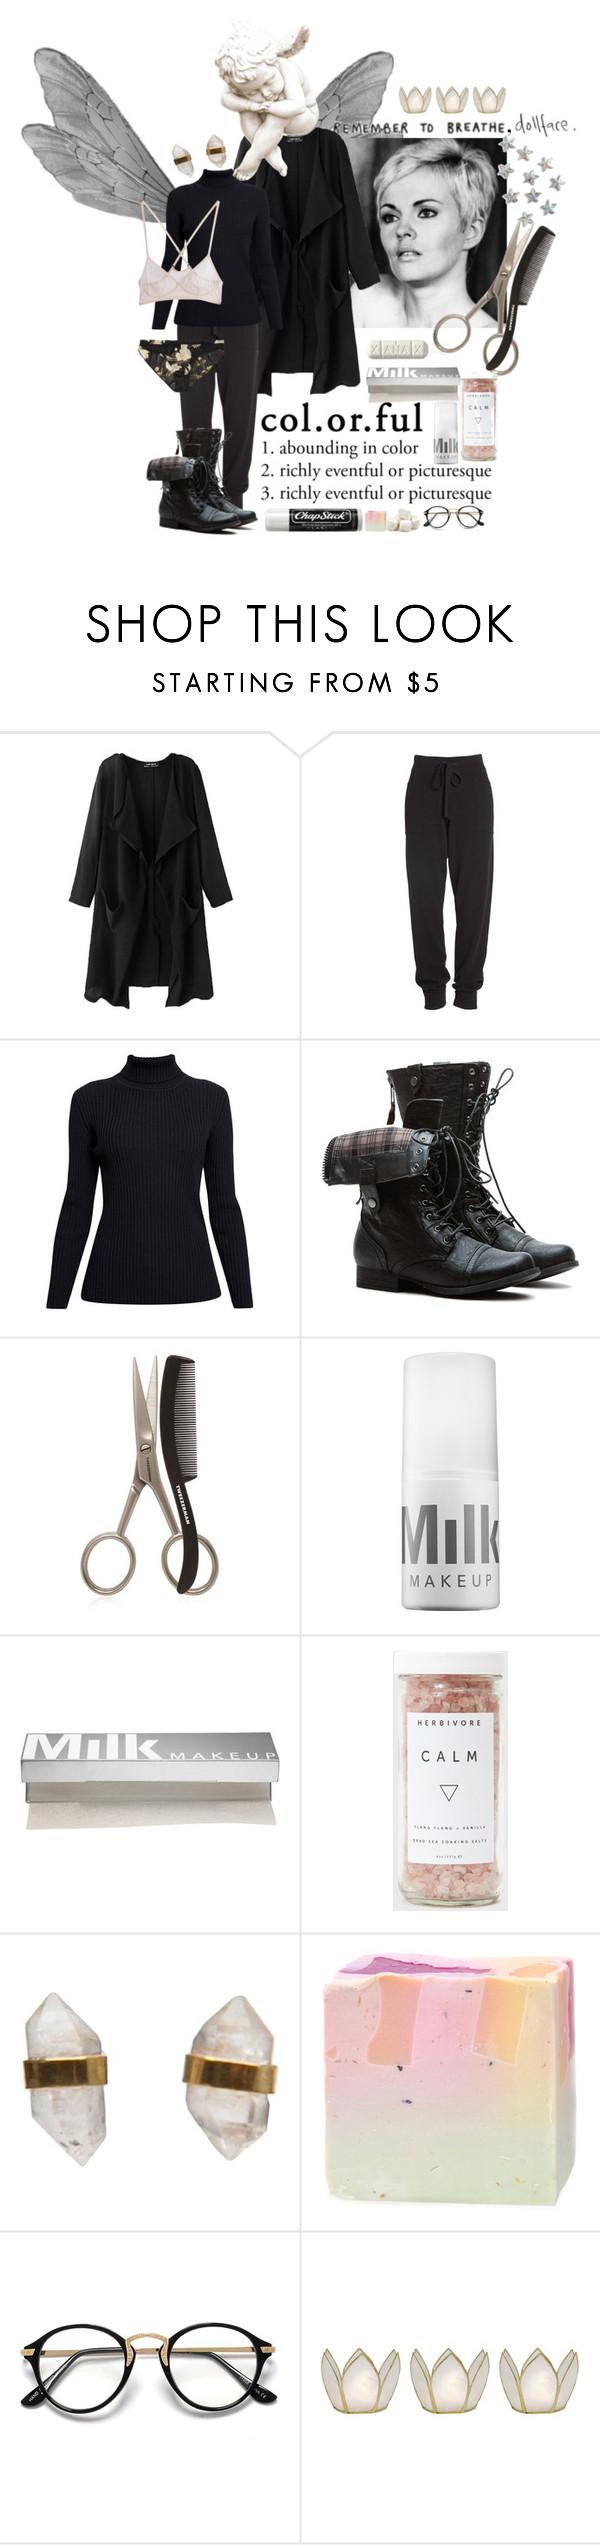 today i am a pixie Clothes design, Women, Fashion